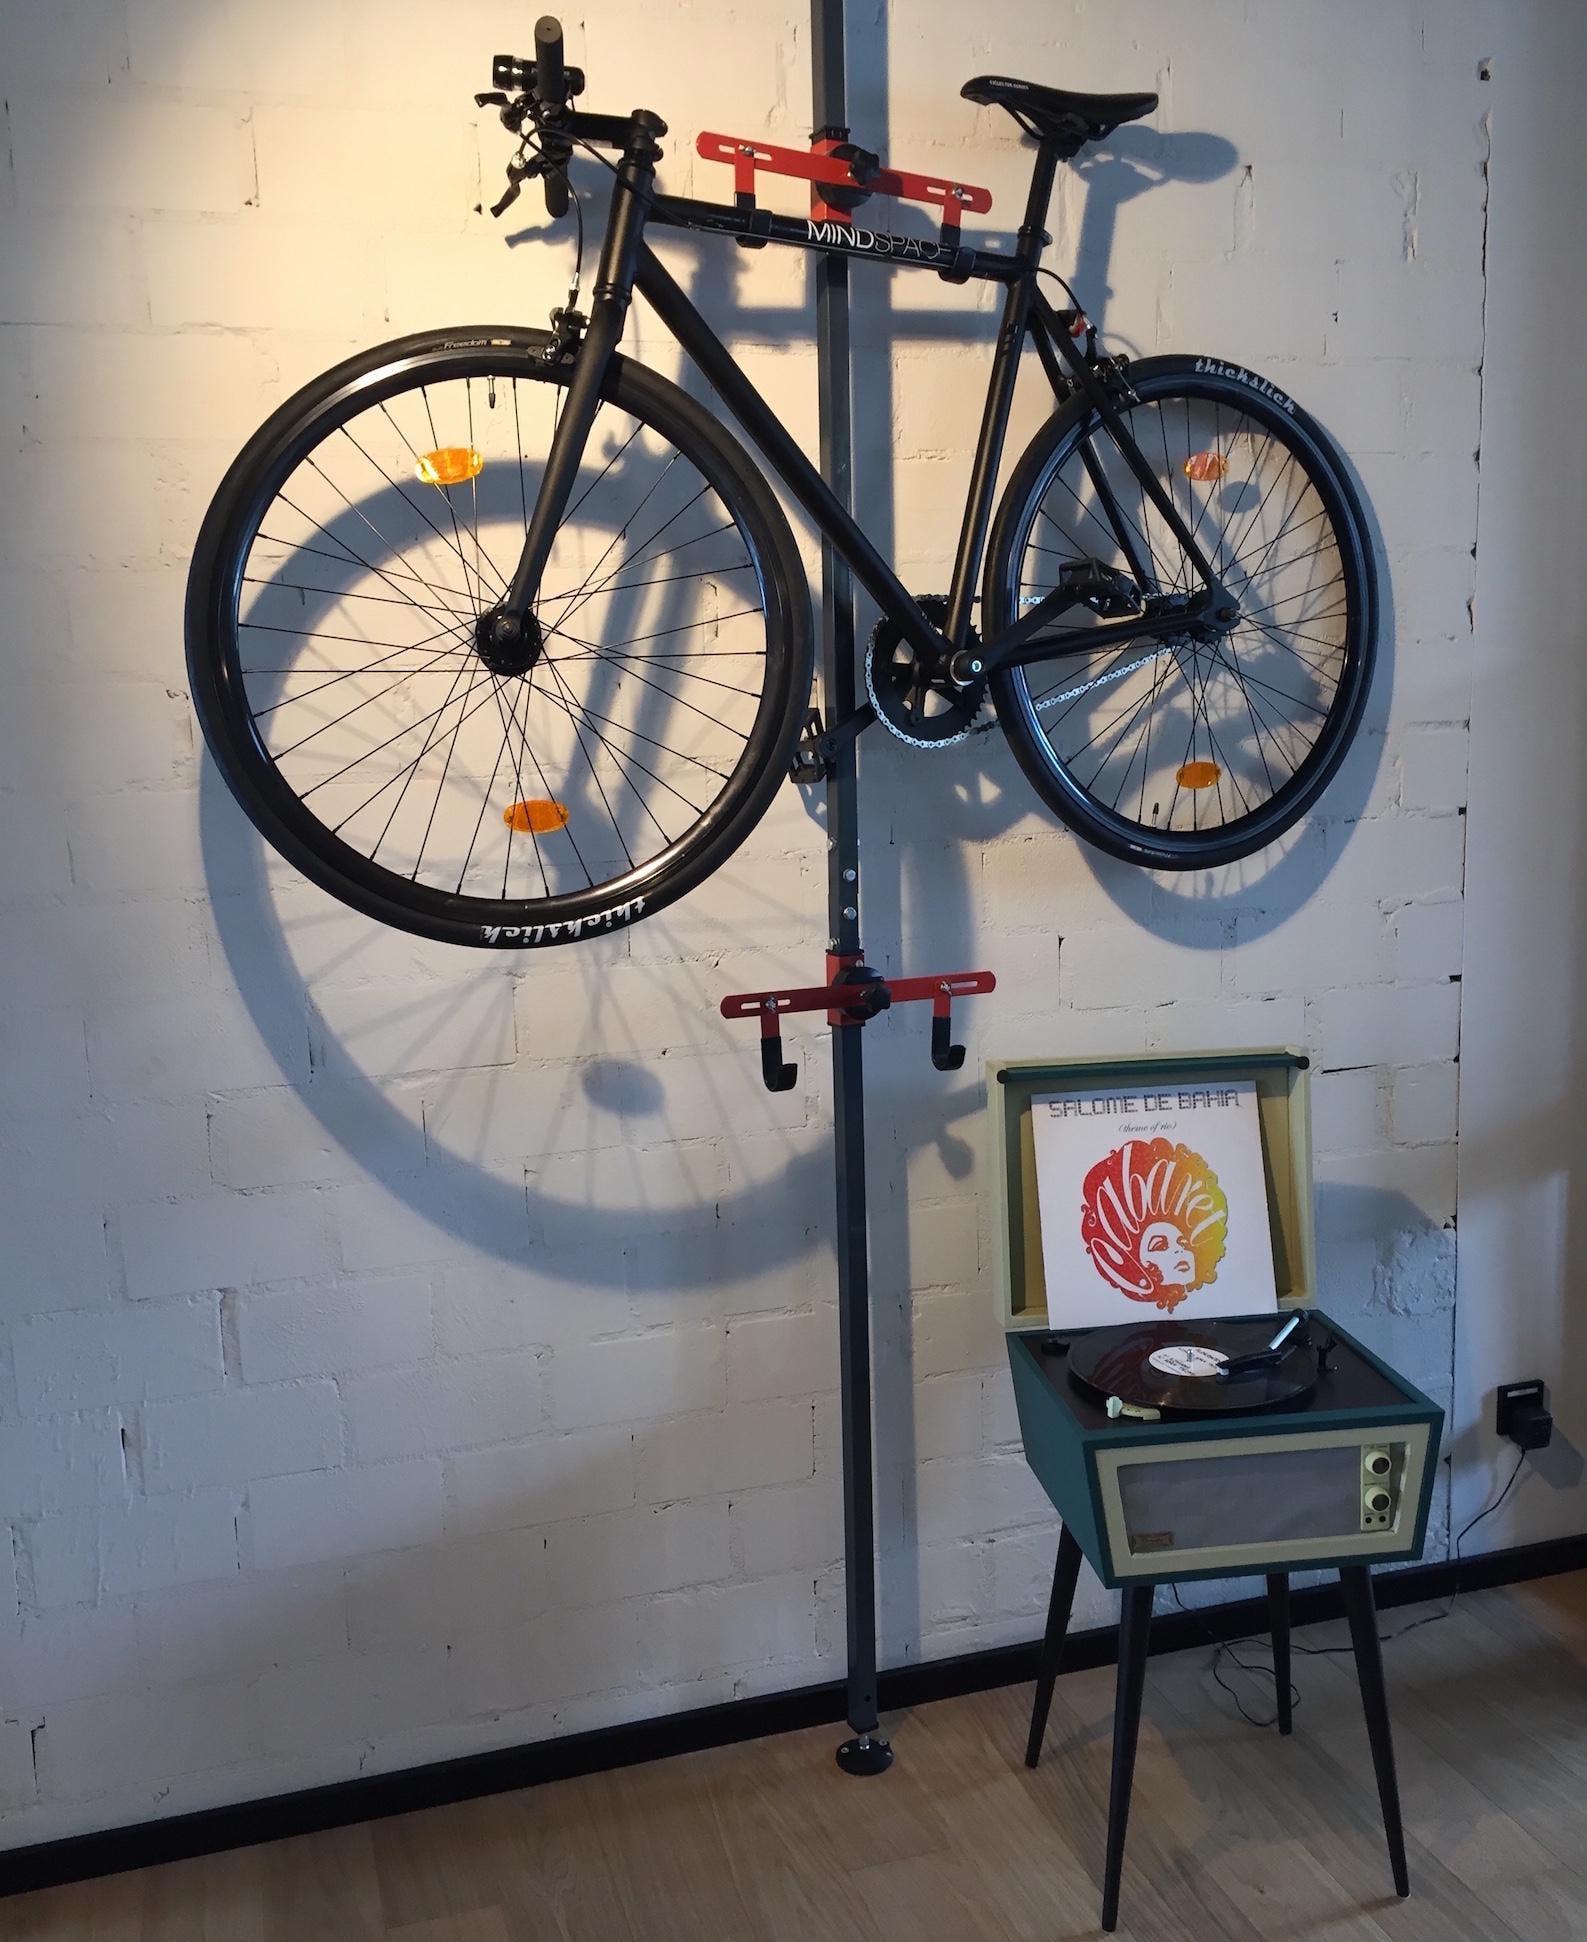 Mindspace bikes